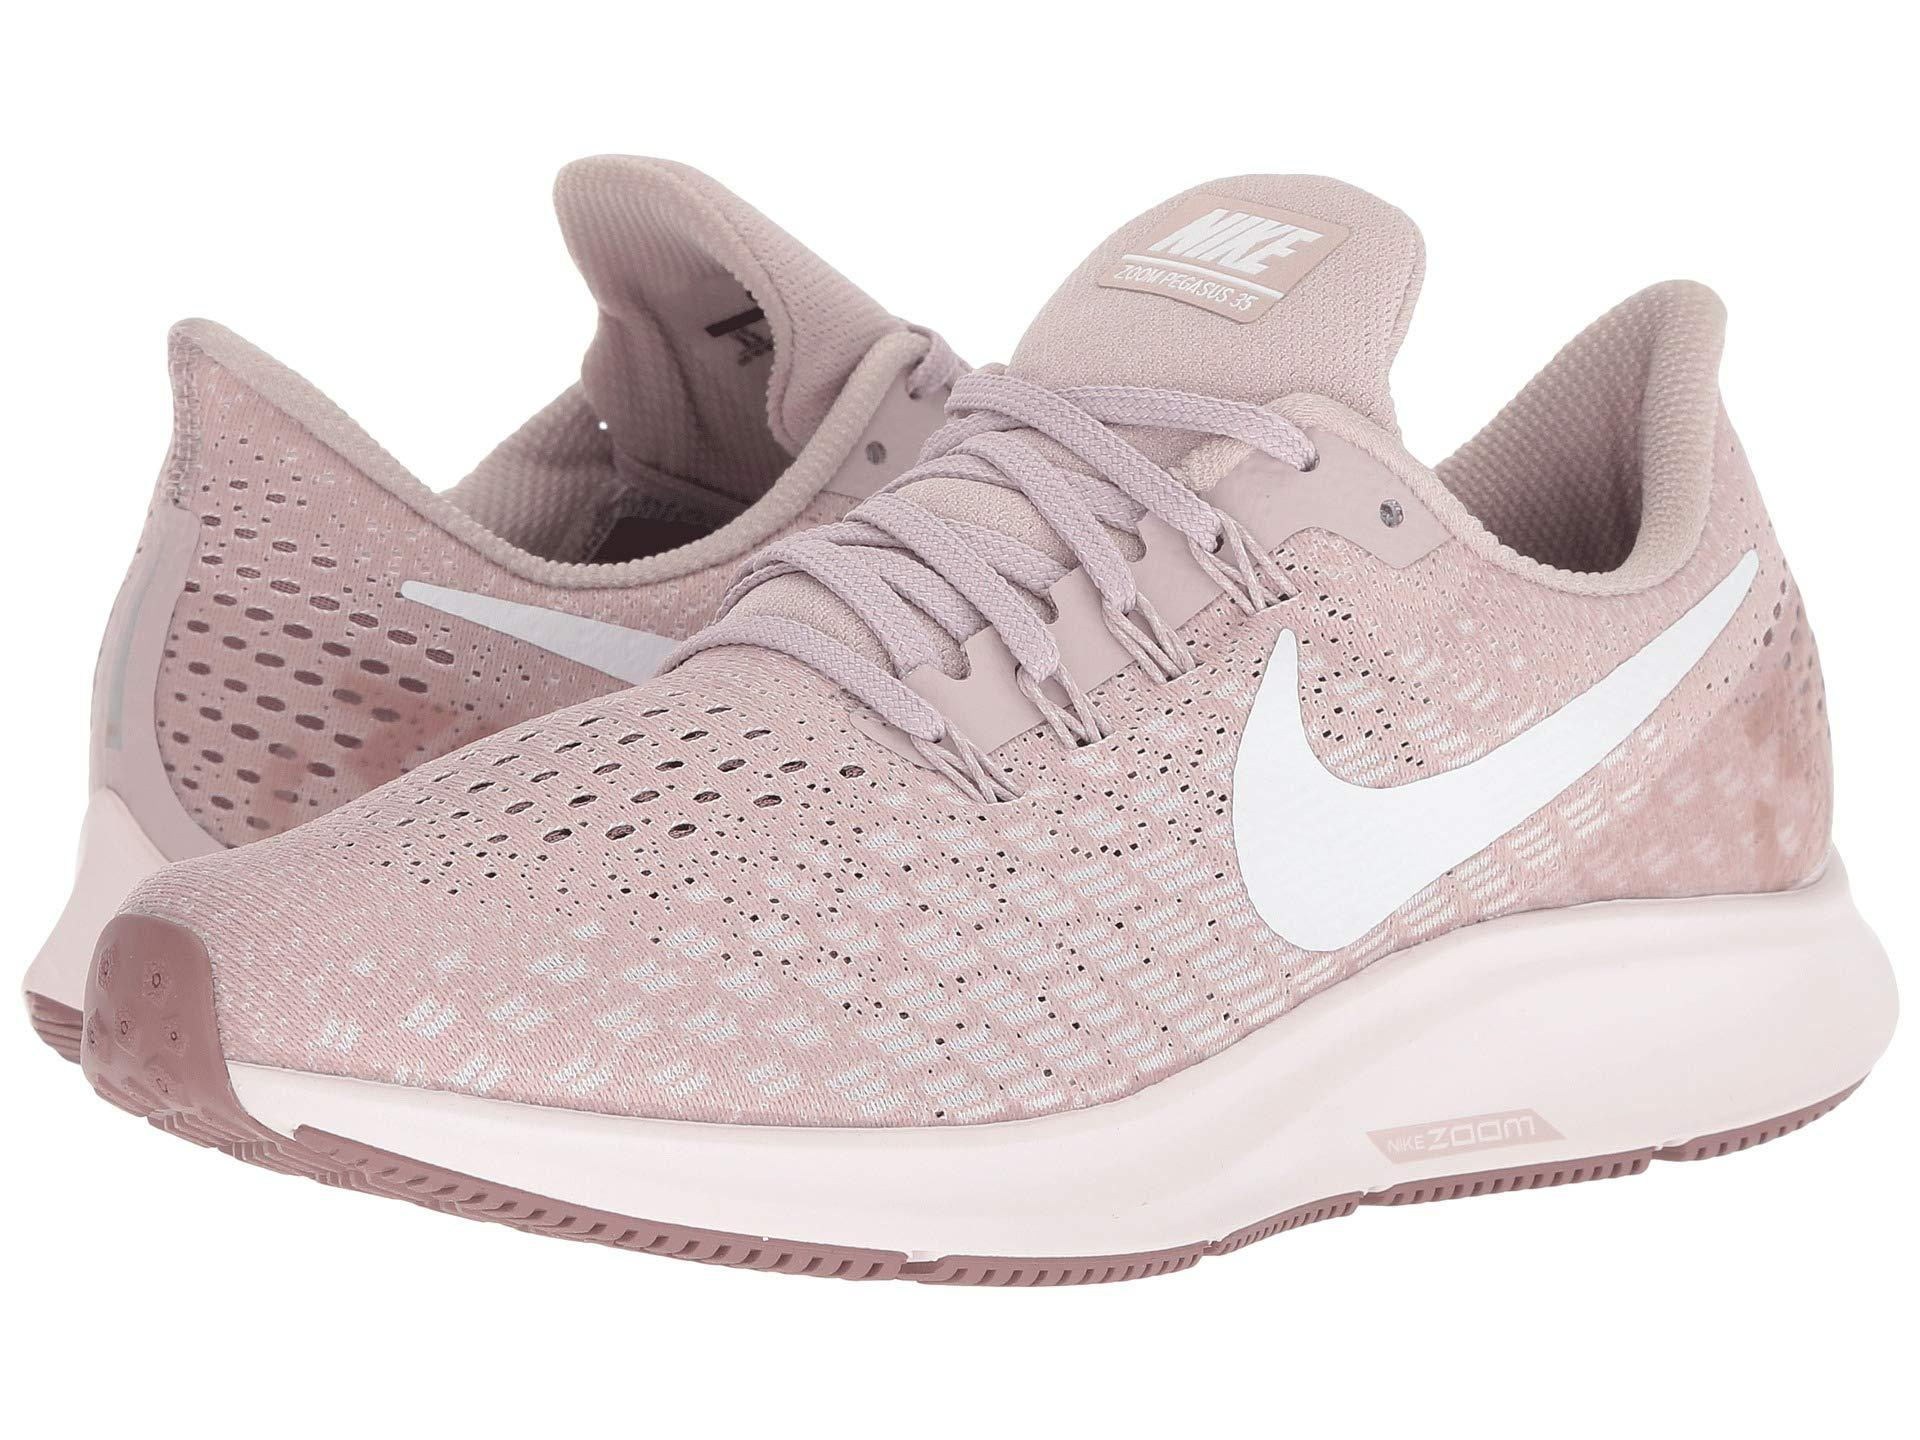 a3632f21f84 Lyst - Nike Air Zoom Pegasus 35 (vast Grey black pink Foam lime ...